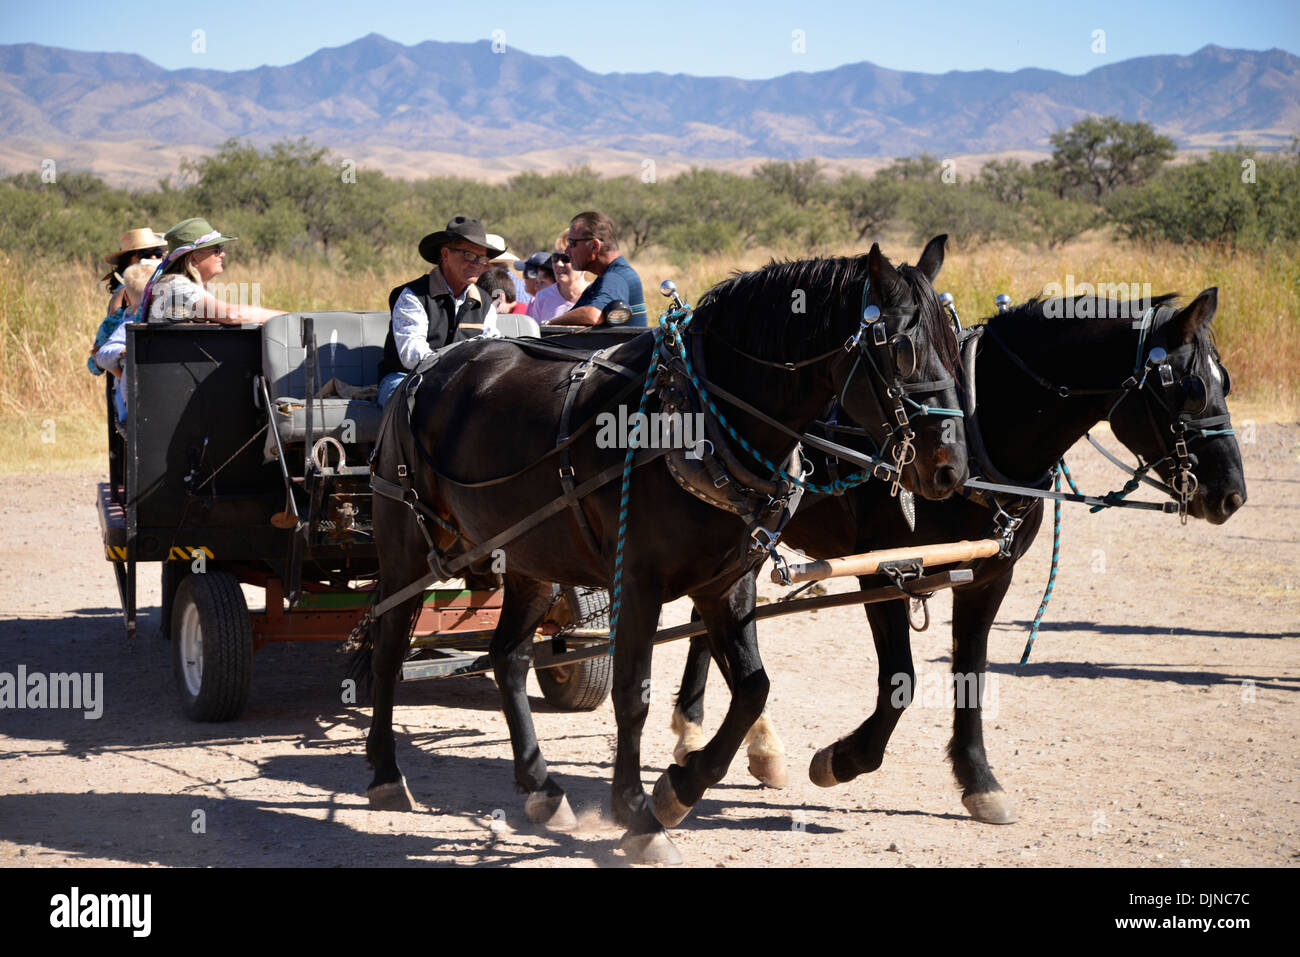 The Roundup & Open House, a celebration of the cowboy, at the Empire Ranch, Sonoita, Arizona, USA. Stock Photo